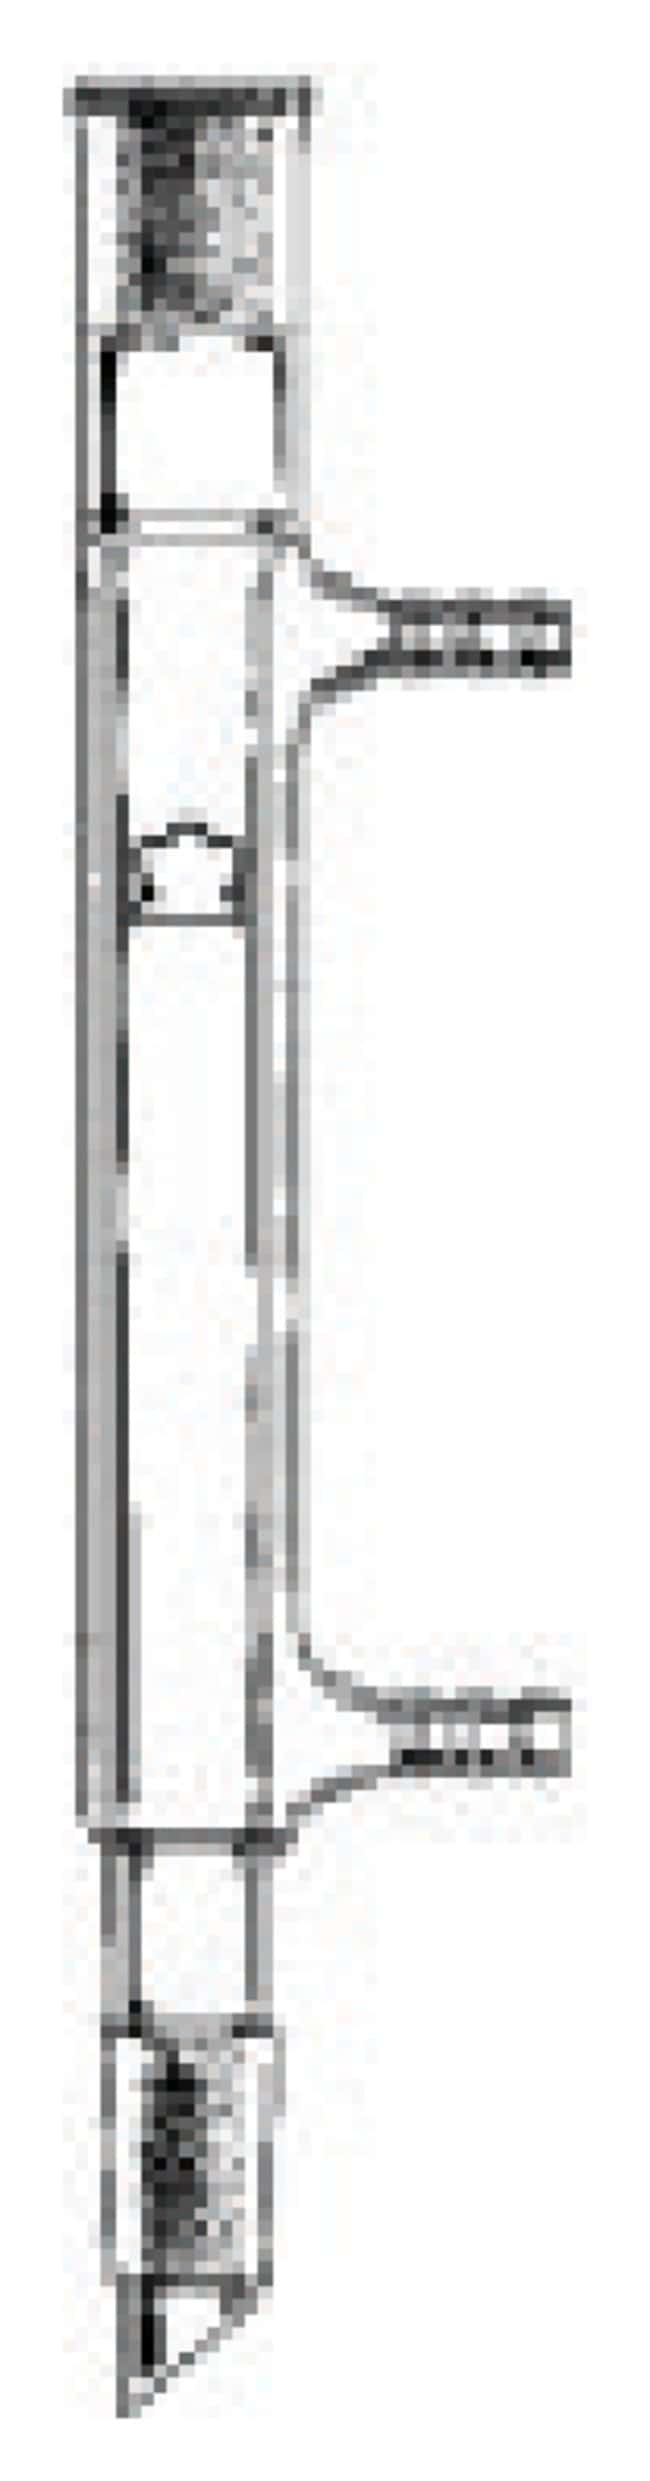 DWK Life SciencesKimble Kontes Liebig Condensers:Specialty Lab Glassware:Condensers